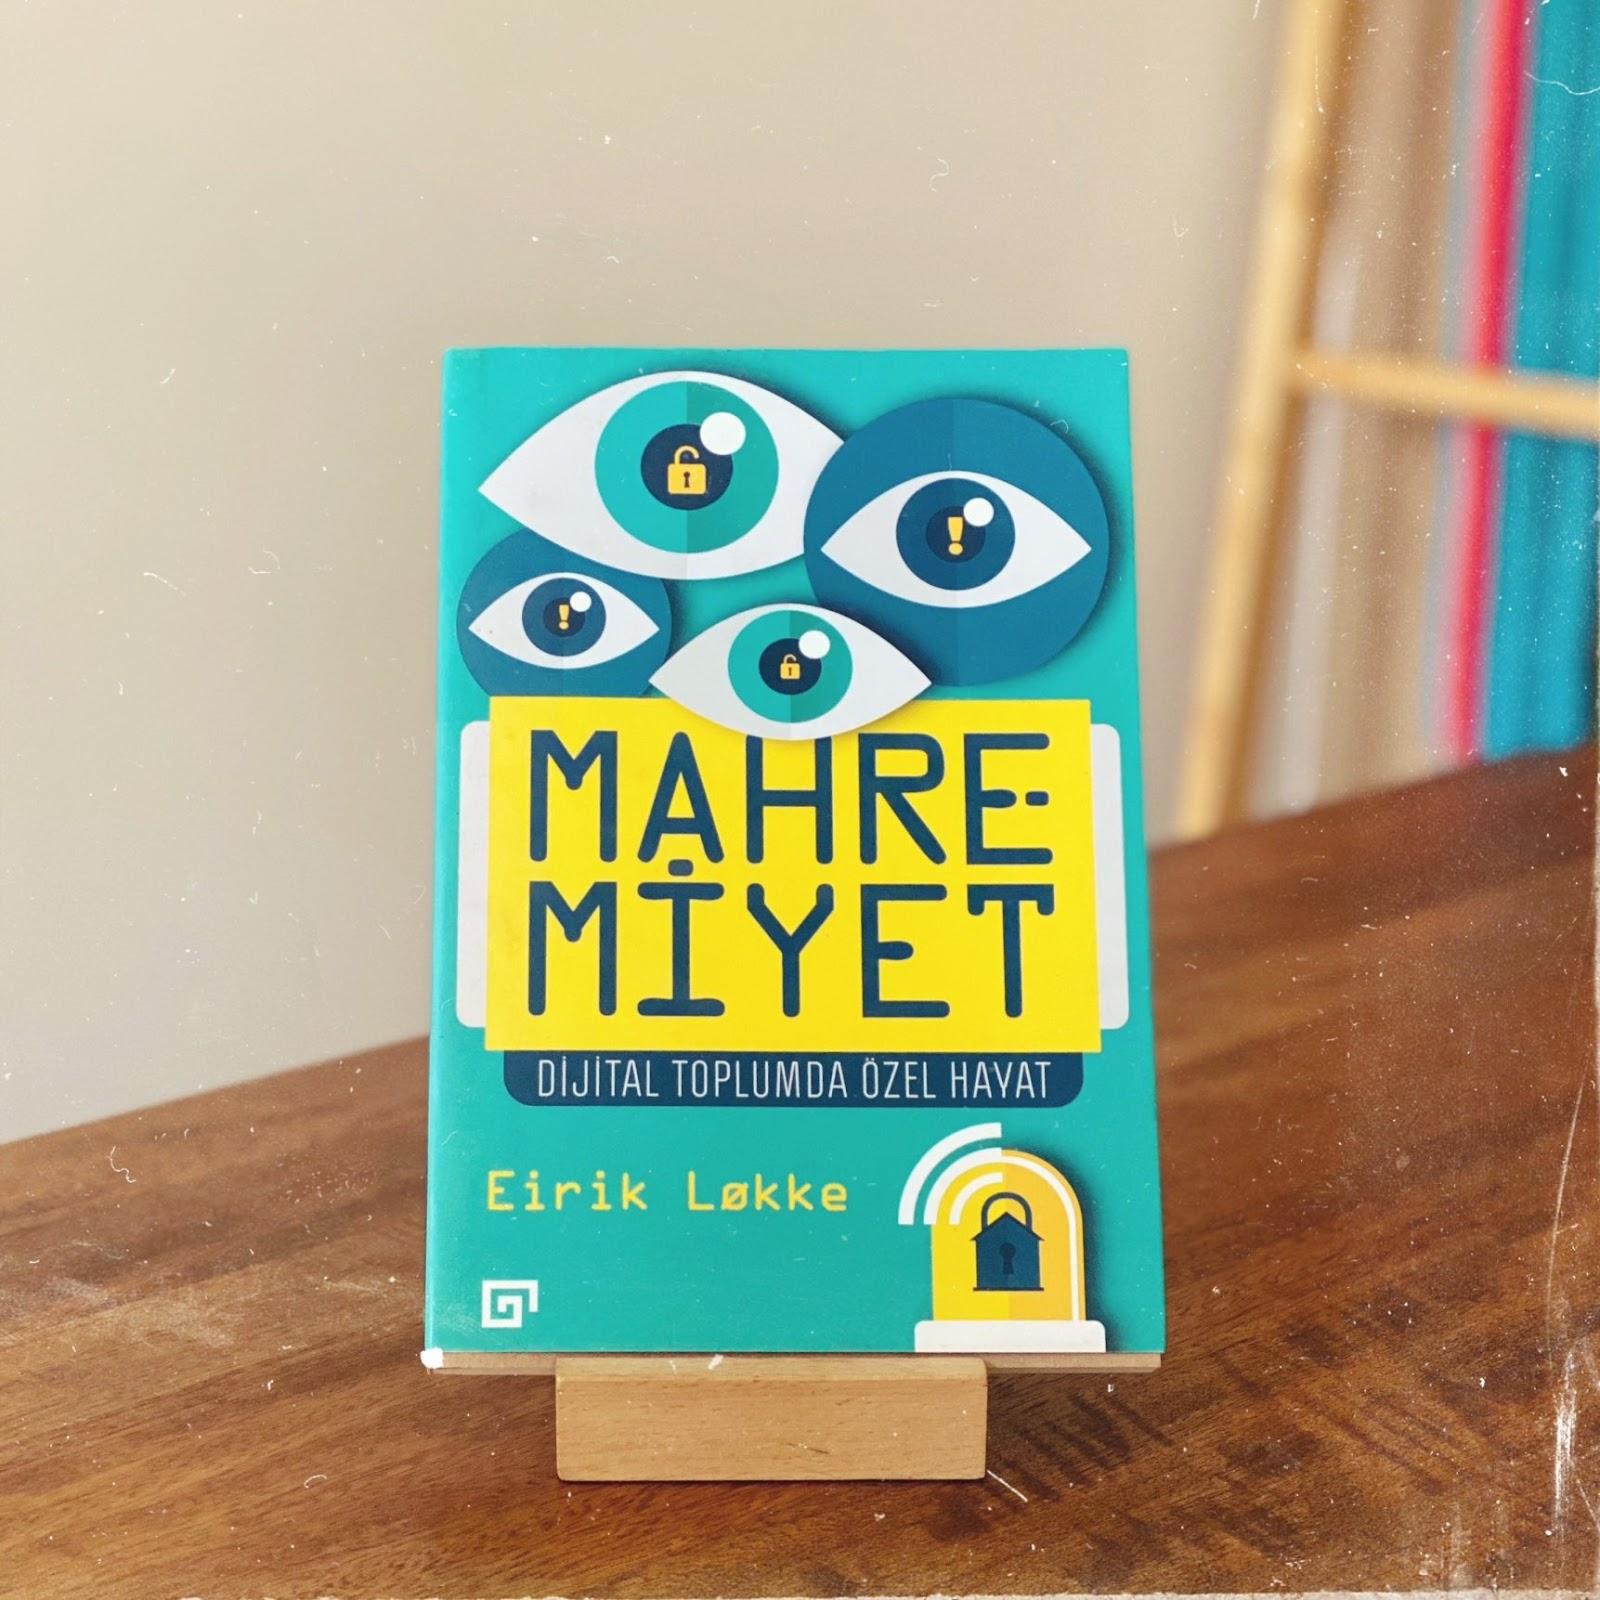 Mahremiyet - Dijital Toplumda Ozel Hayat (Kitap)